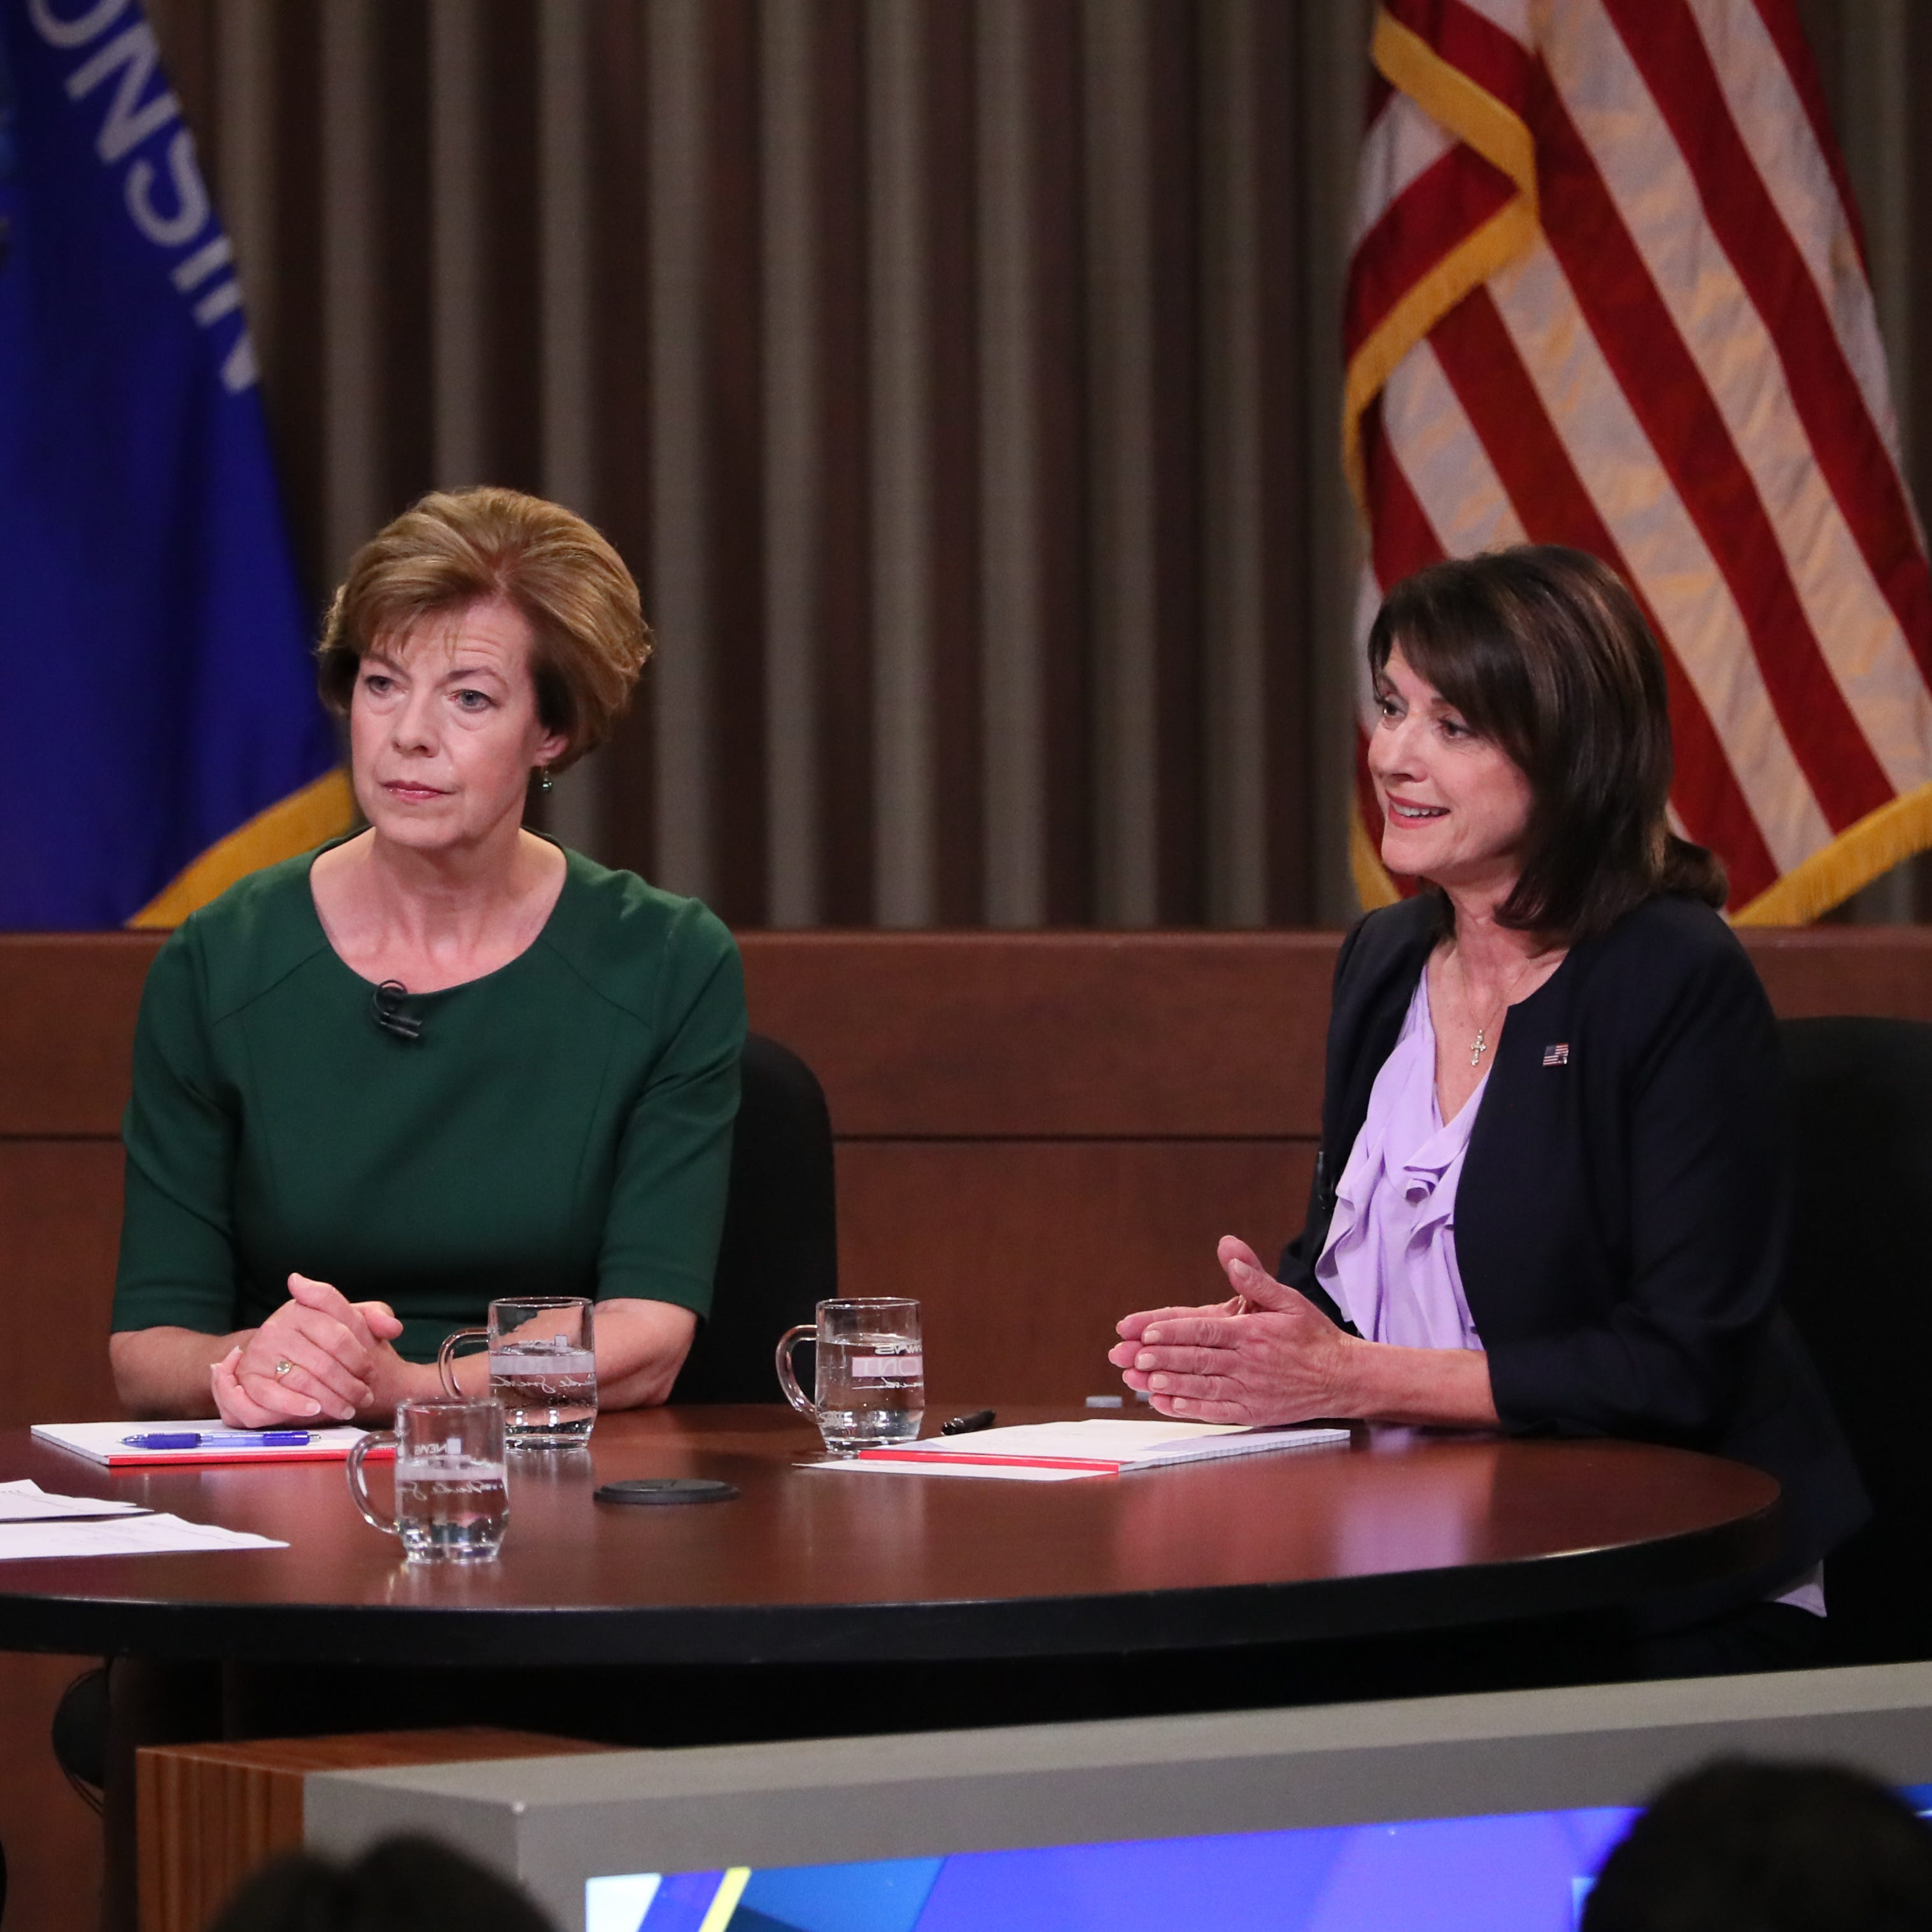 Wisconsin U.S. Senate: Leah Vukmir, Tammy Baldwin clash on health care, Tomah VA in final debate